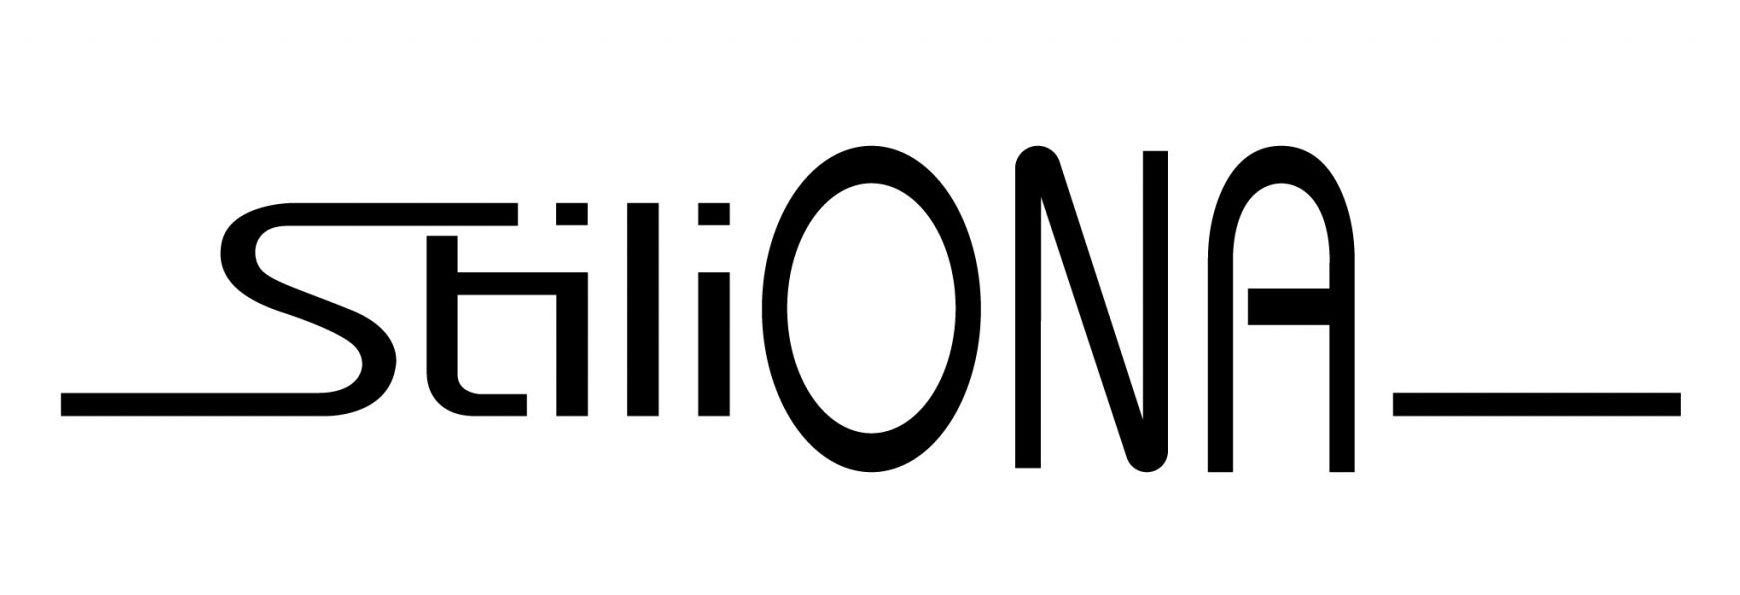 Stiliona